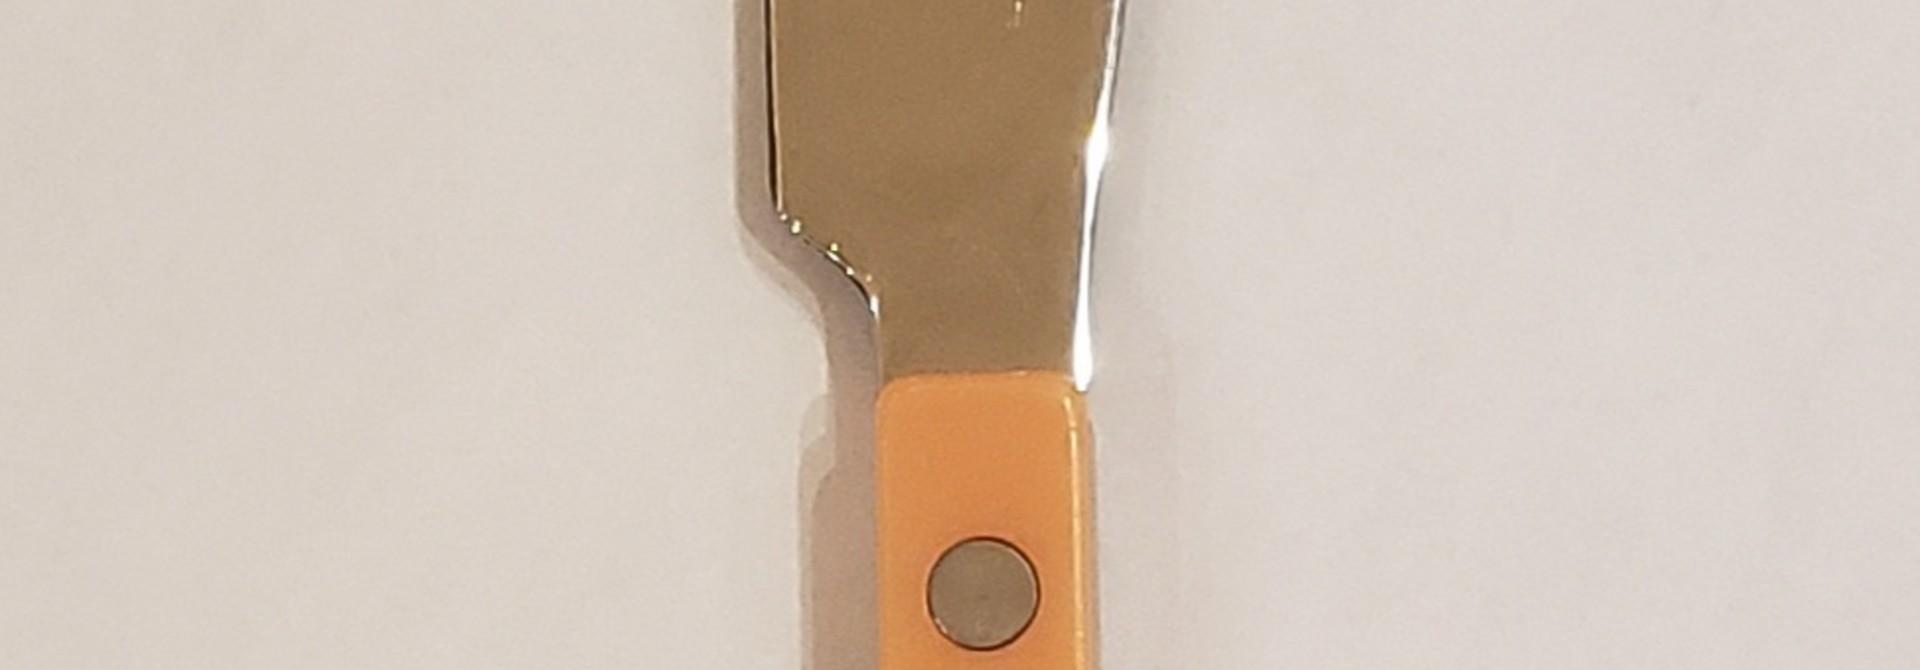 Cheese Knife - Lge - Rose